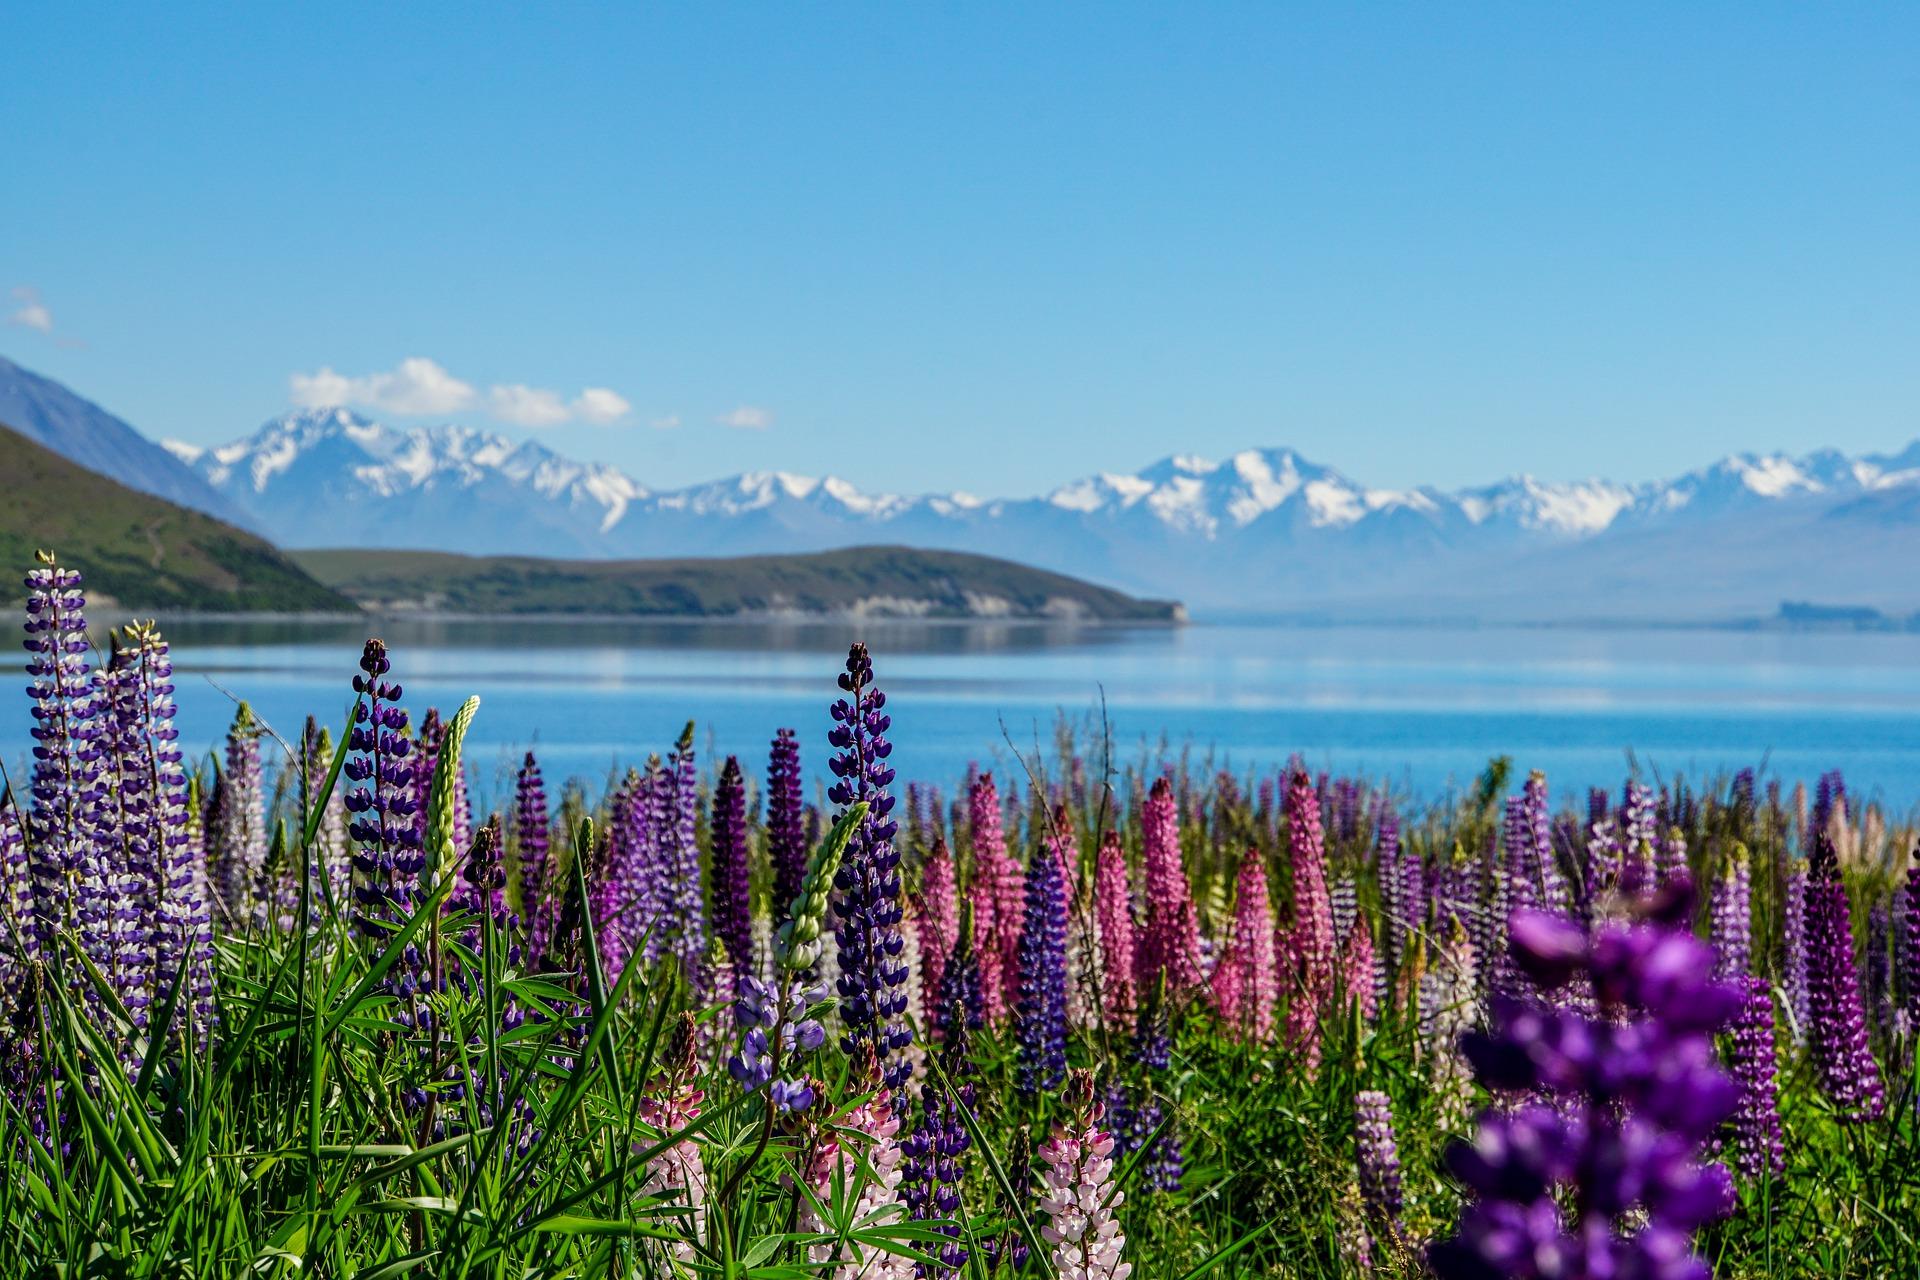 flowers-lake-mountains - travel off-season